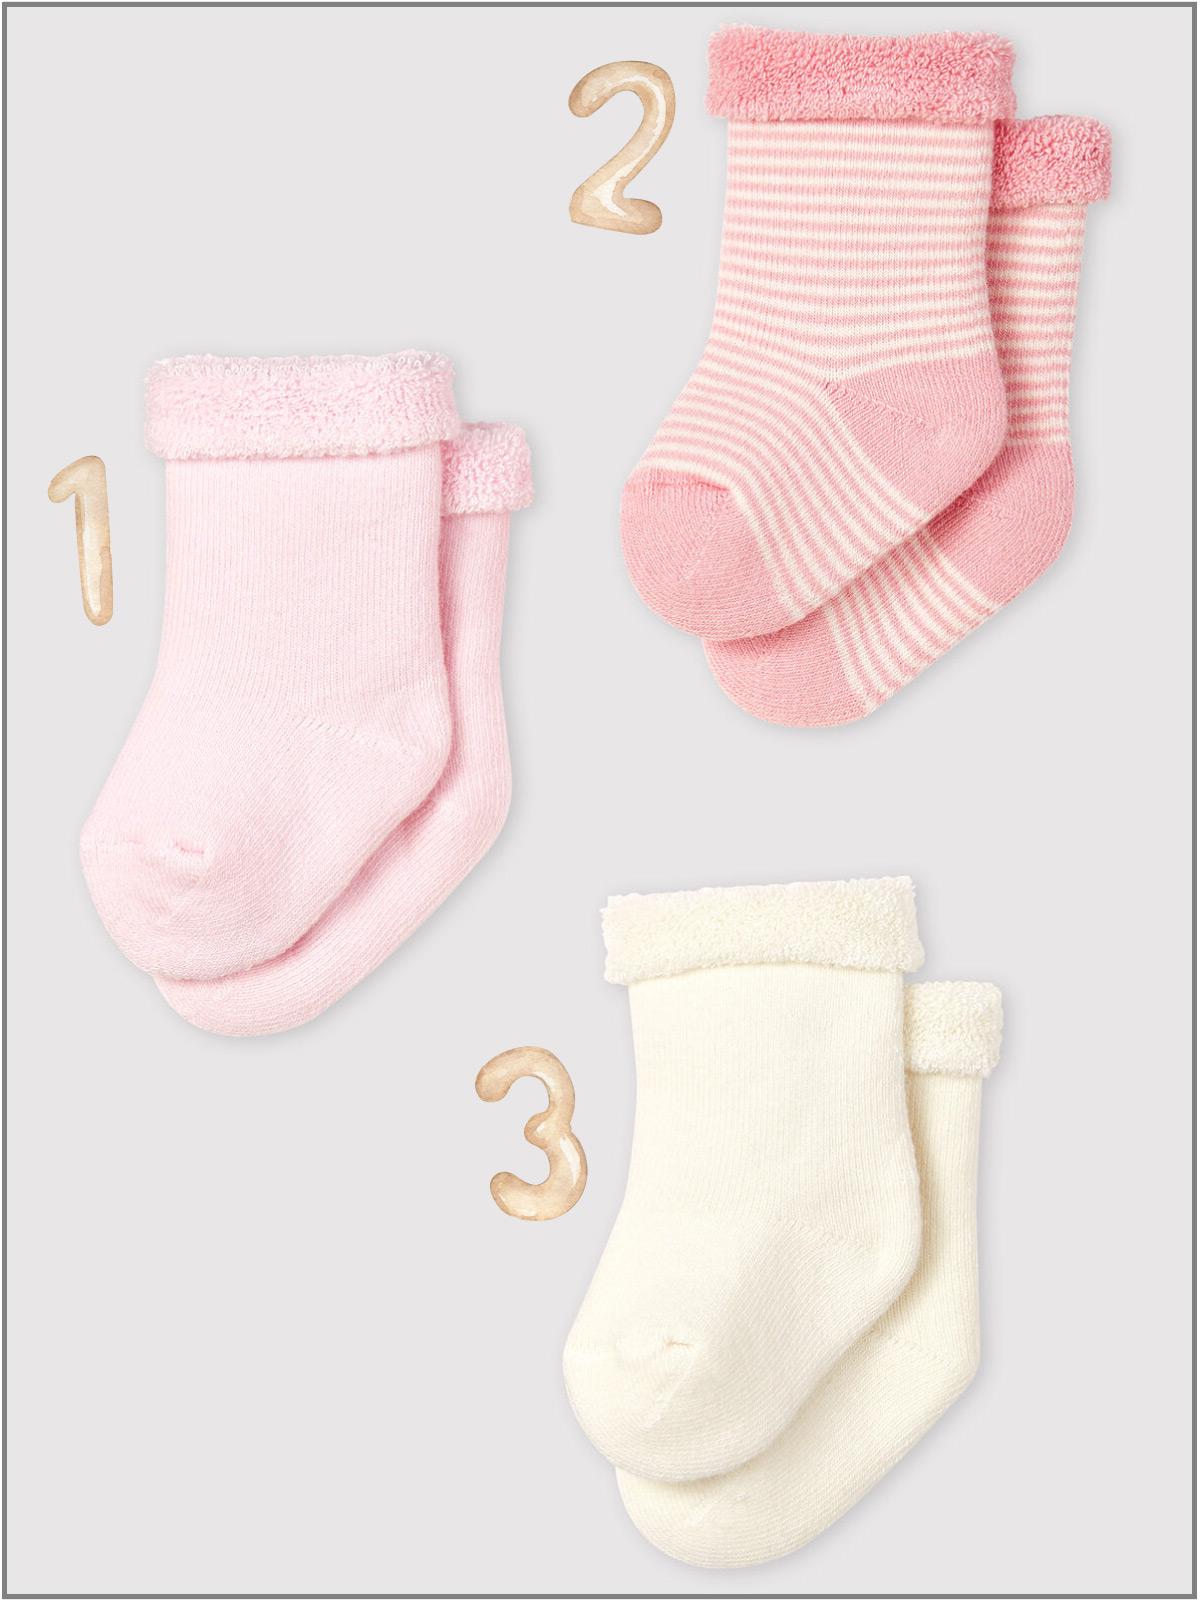 frederickandsophie-kids-soft-wear-petitbateau-france-newborn-baby-socks-organic-pink